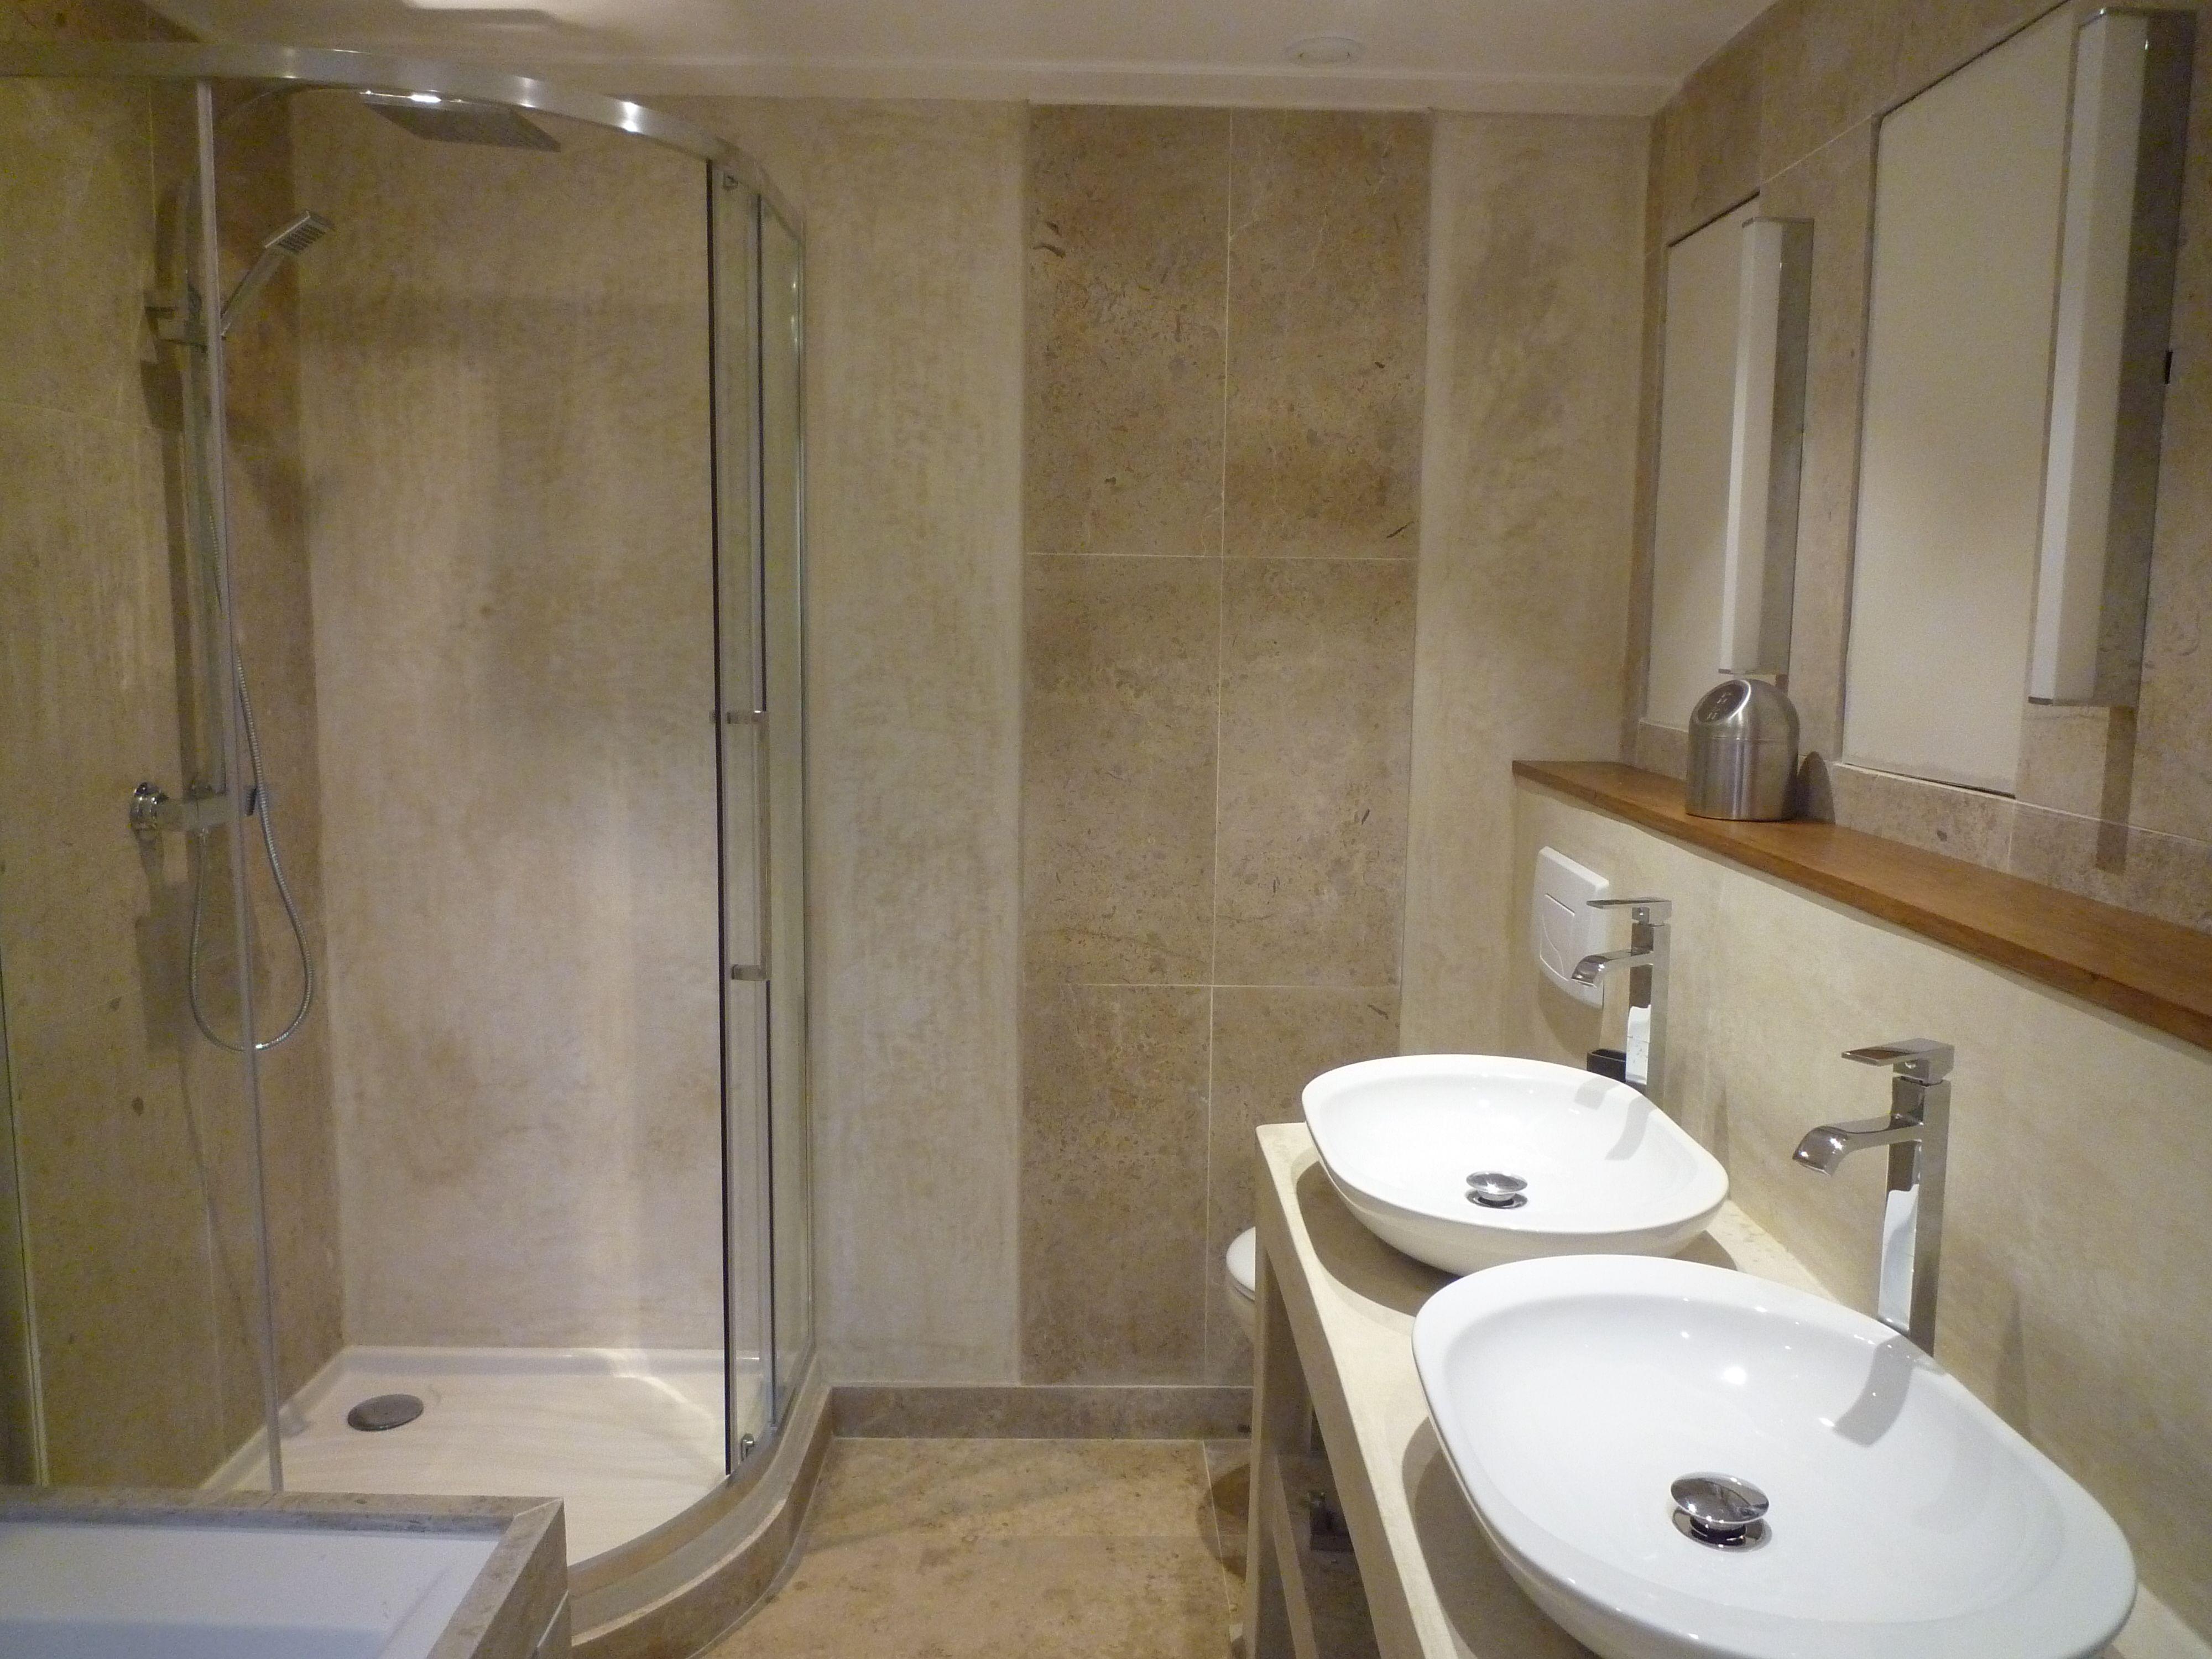 Salle de bain – Suisse | KAREA CREATION | bathrooms | Pinterest ...